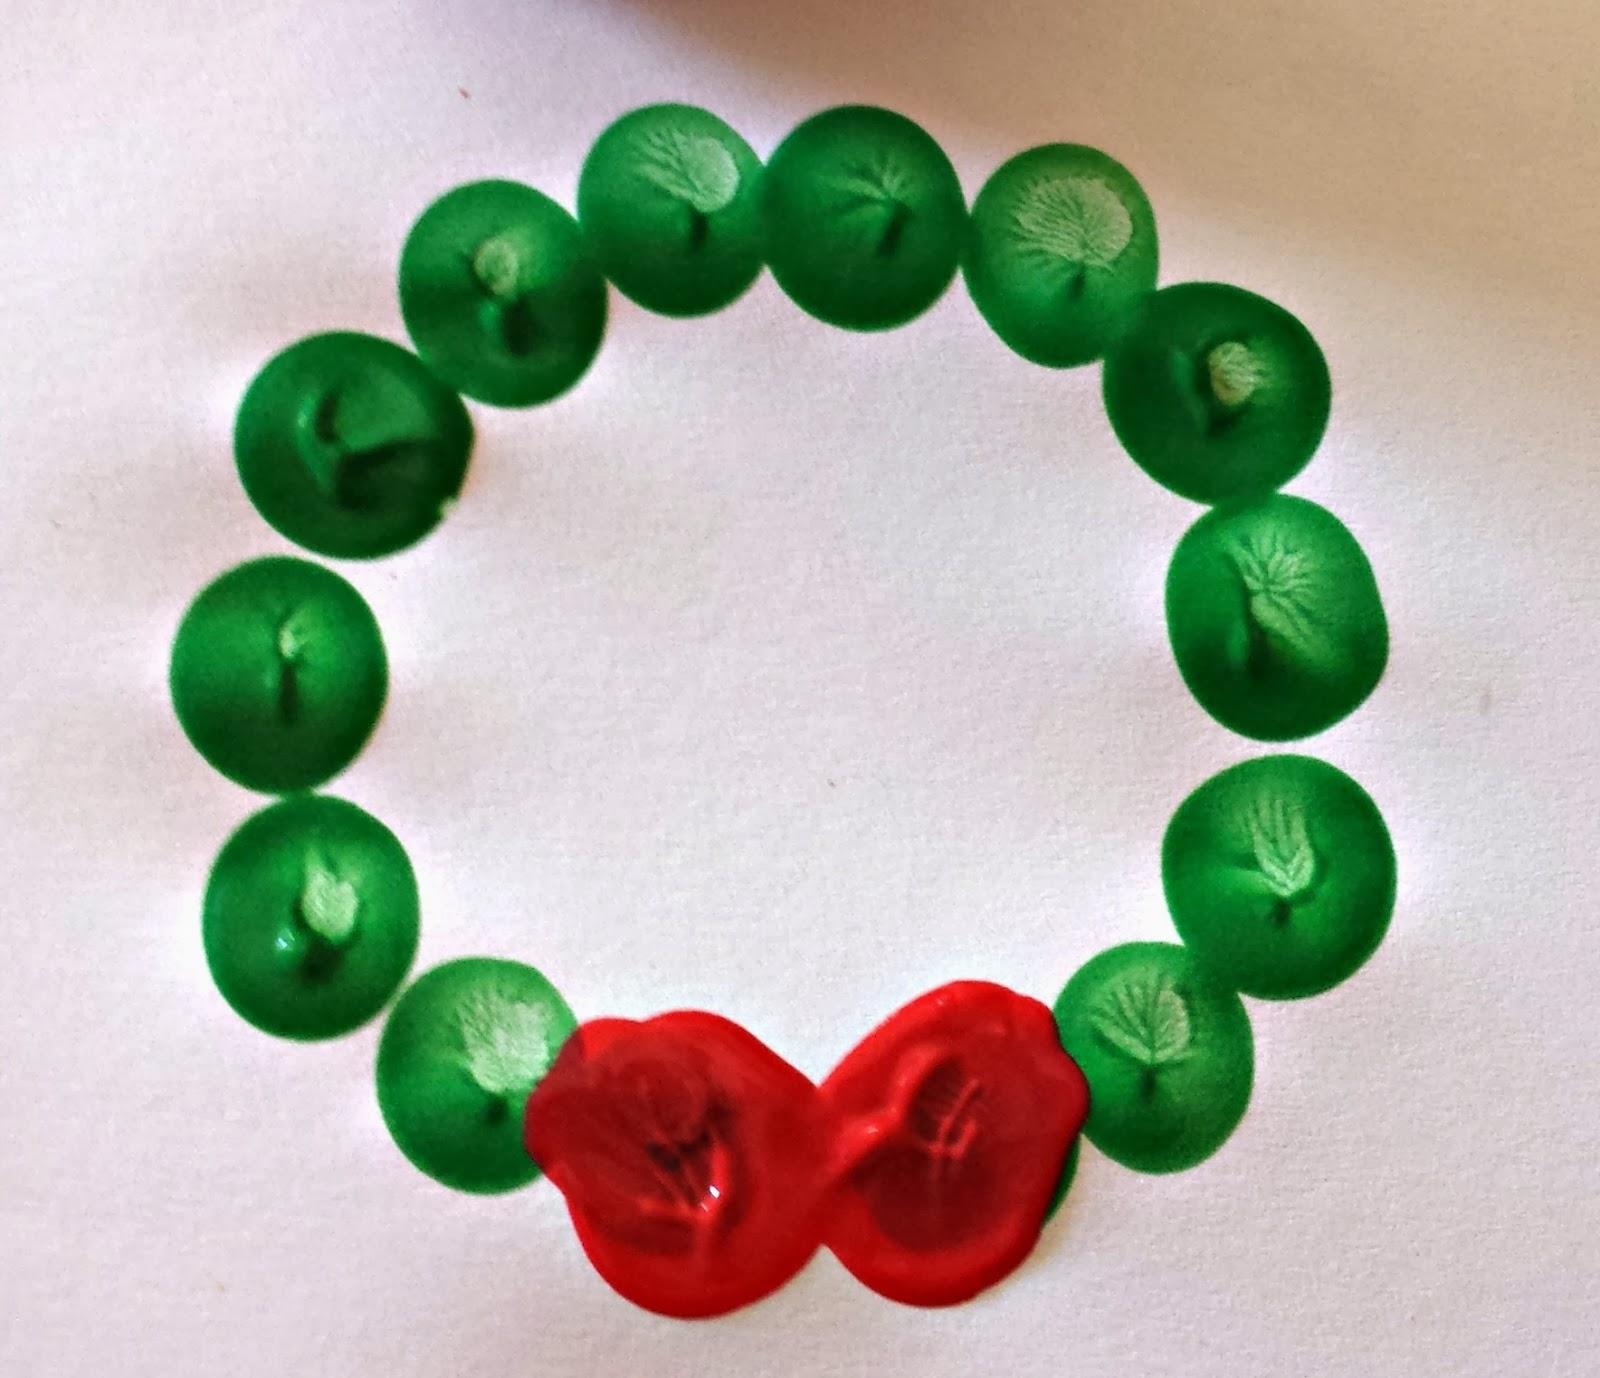 Wreath Crafts For Kids Part - 47: Fingerprint Christmas Wreath Craft For Kids